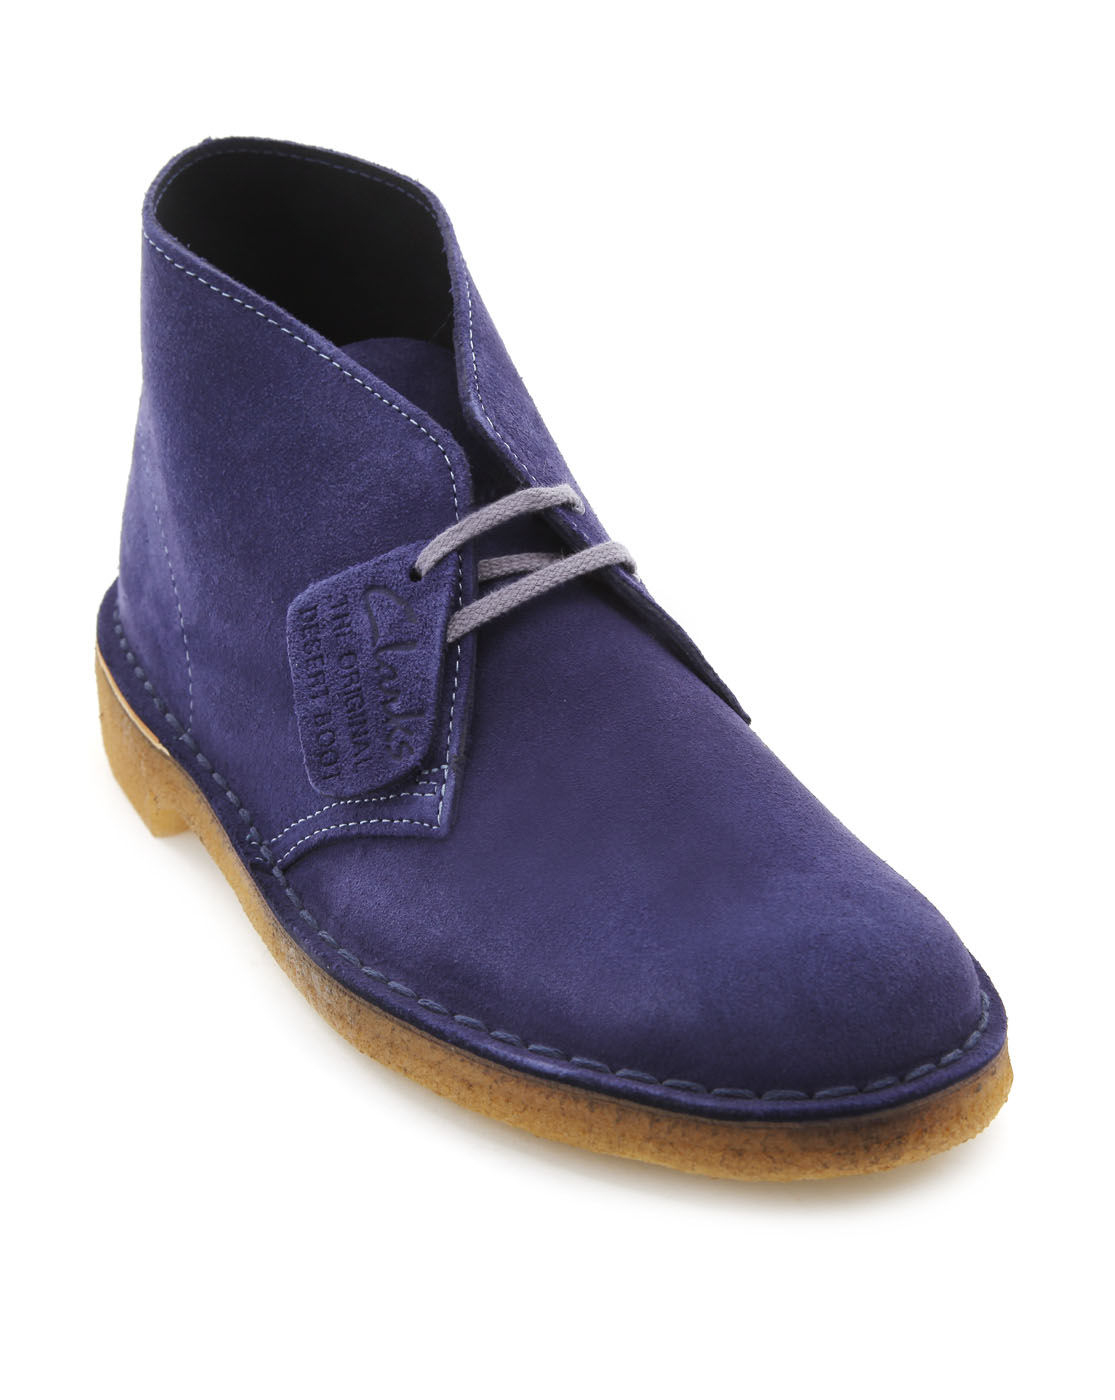 clarks original blue suede desert boots in blue for lyst